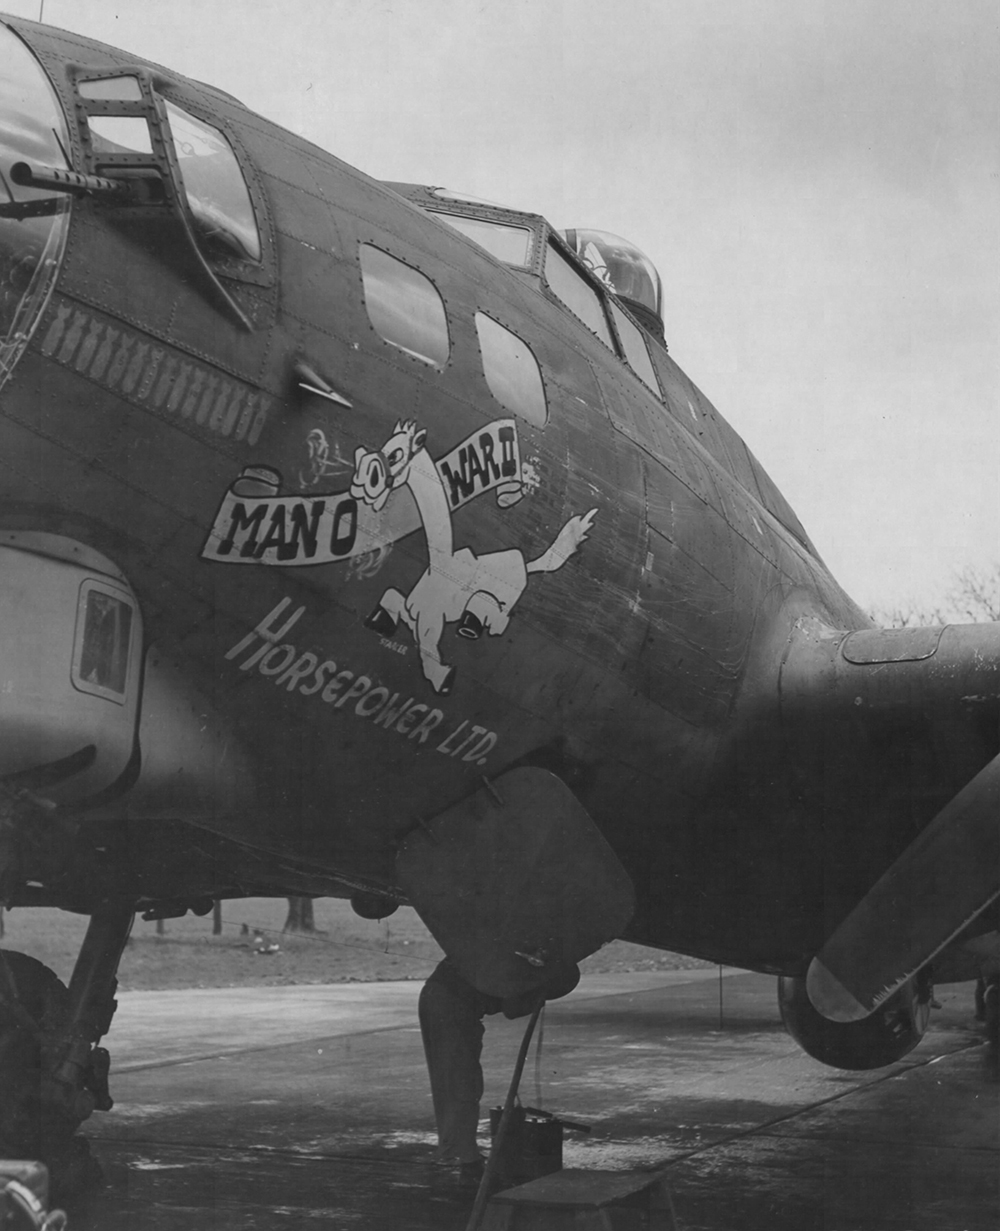 B-17 #42-38083 / Man 'O War II – Horsepower Ltd